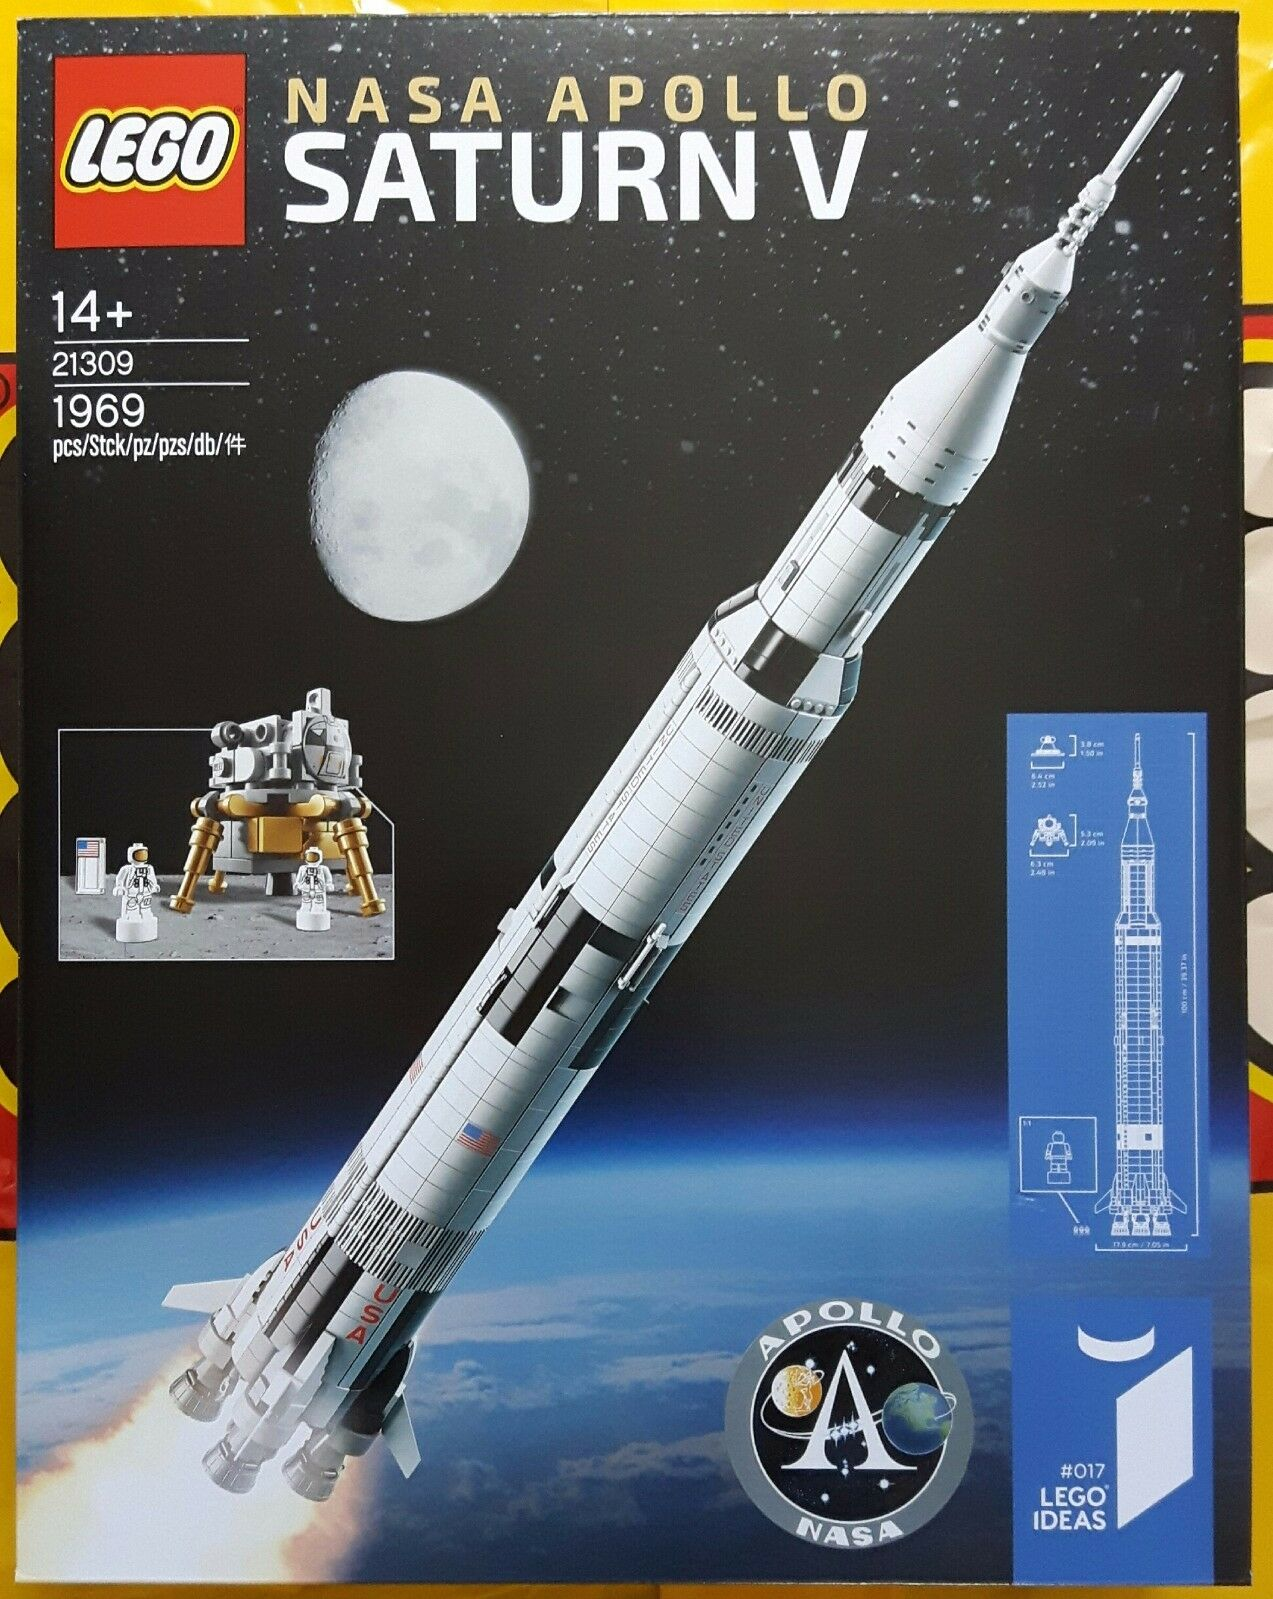 LEGO ® ideas 21309 Nasa Apollo Saturn V (5) NUOVO & OVP NEW AND SEALED 1969 pieces